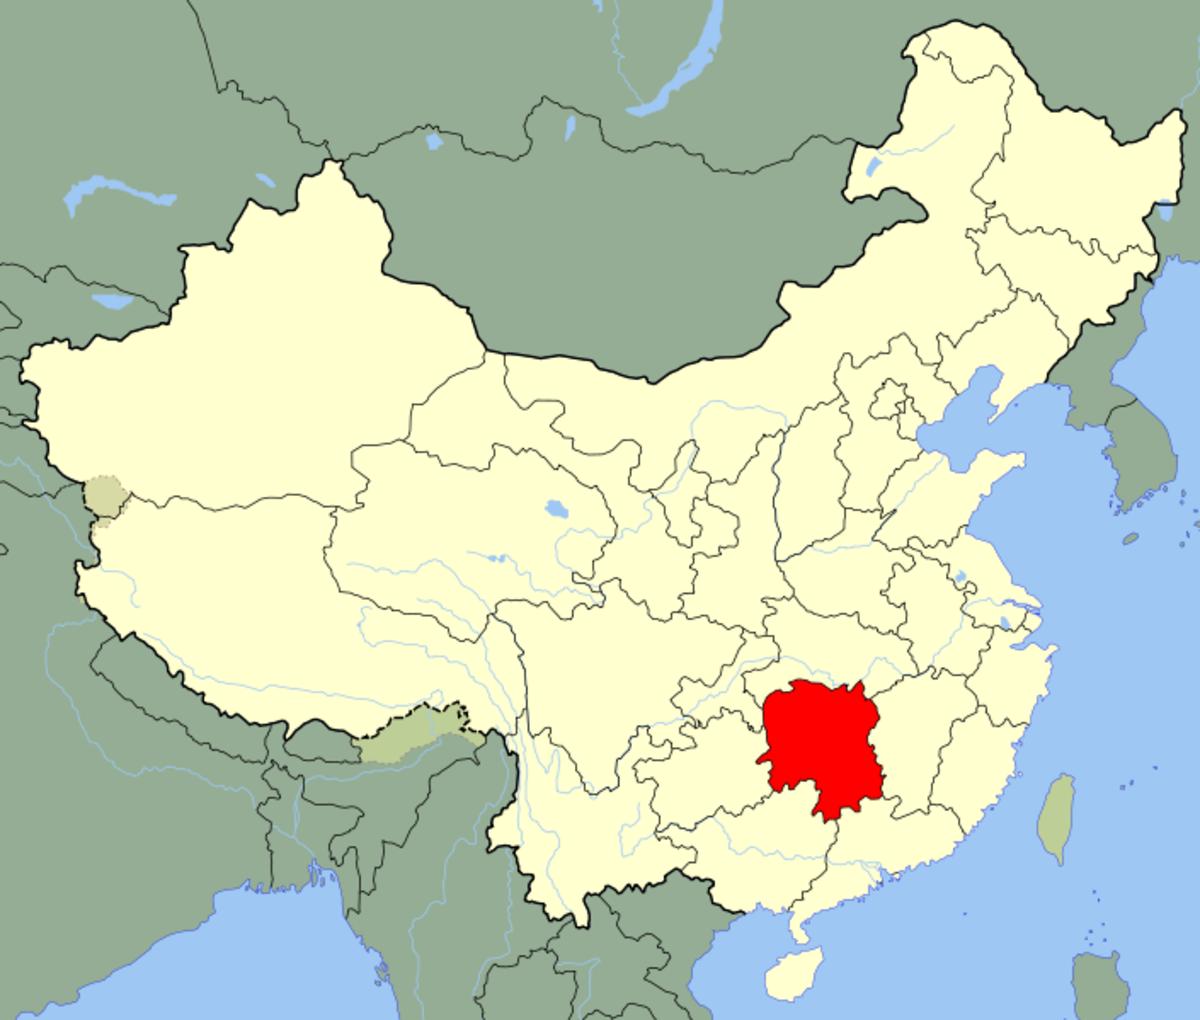 Hunan in red.